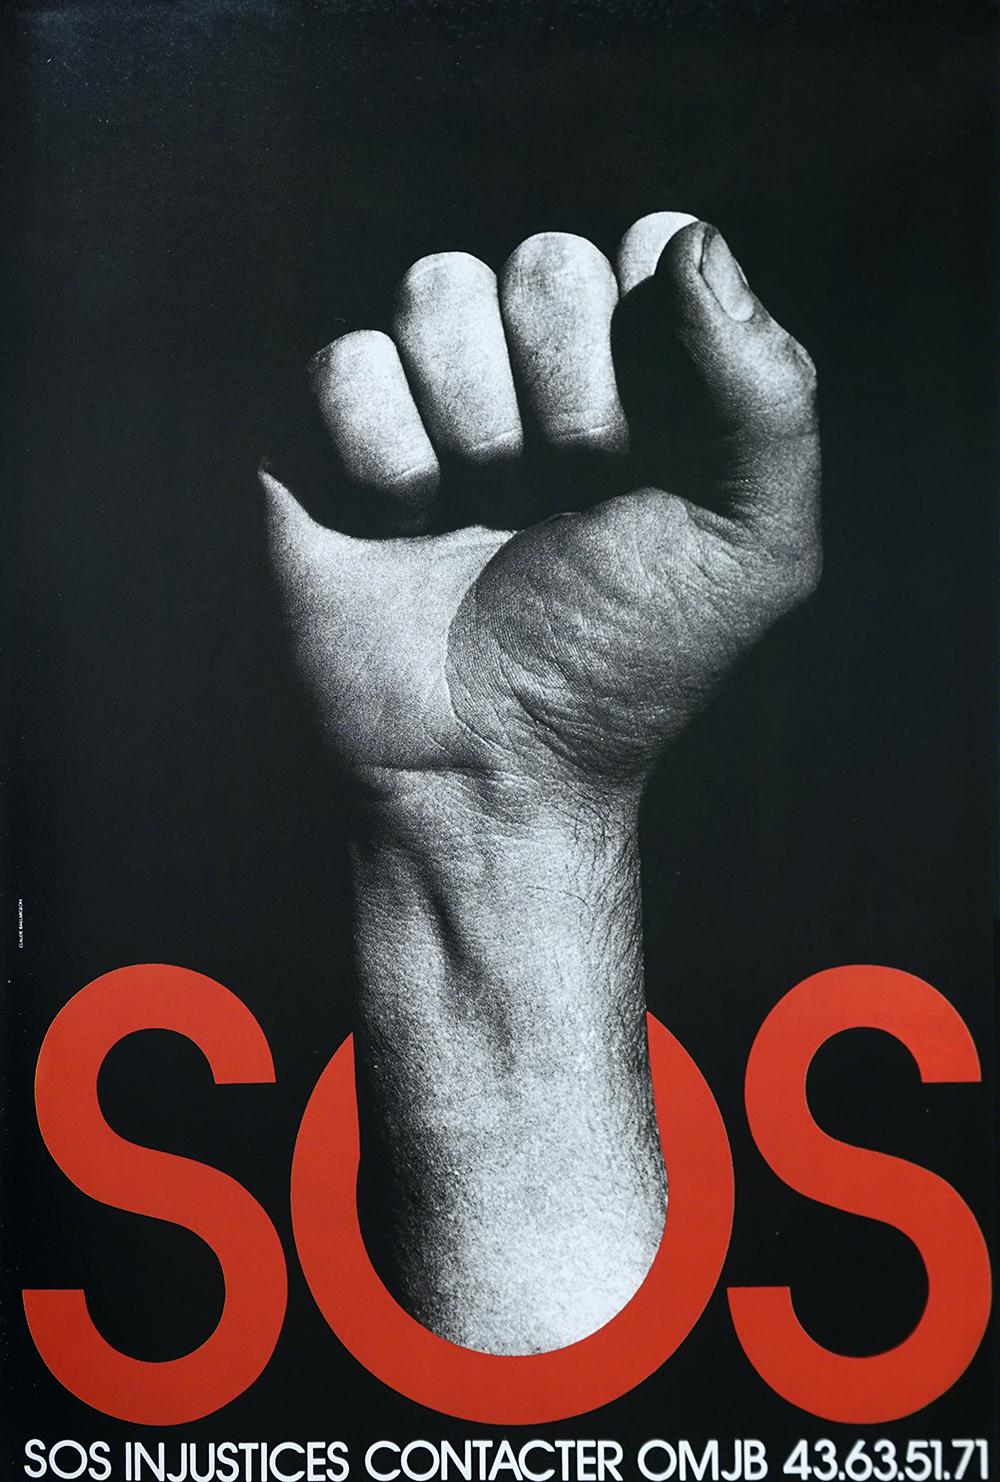 SOS-c-baillargeon-web-1990.jpg